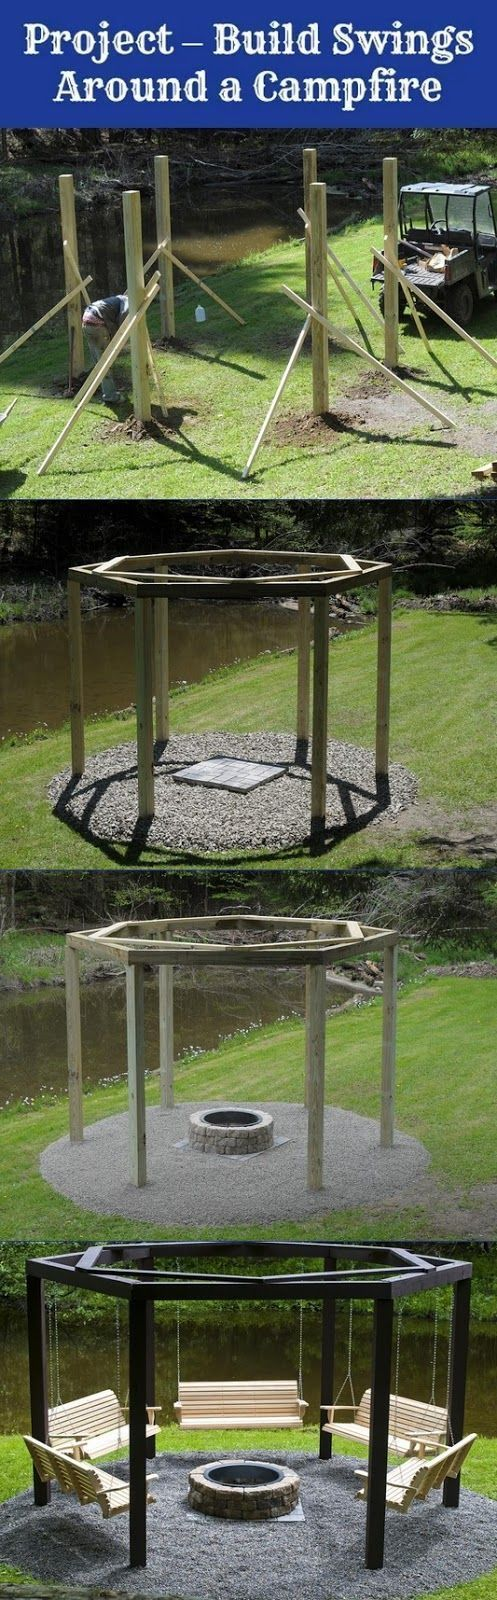 How to Build Swings Around a Campfire, DIY, landscape design, landscape architecture, landscaping, firepit, fire pit